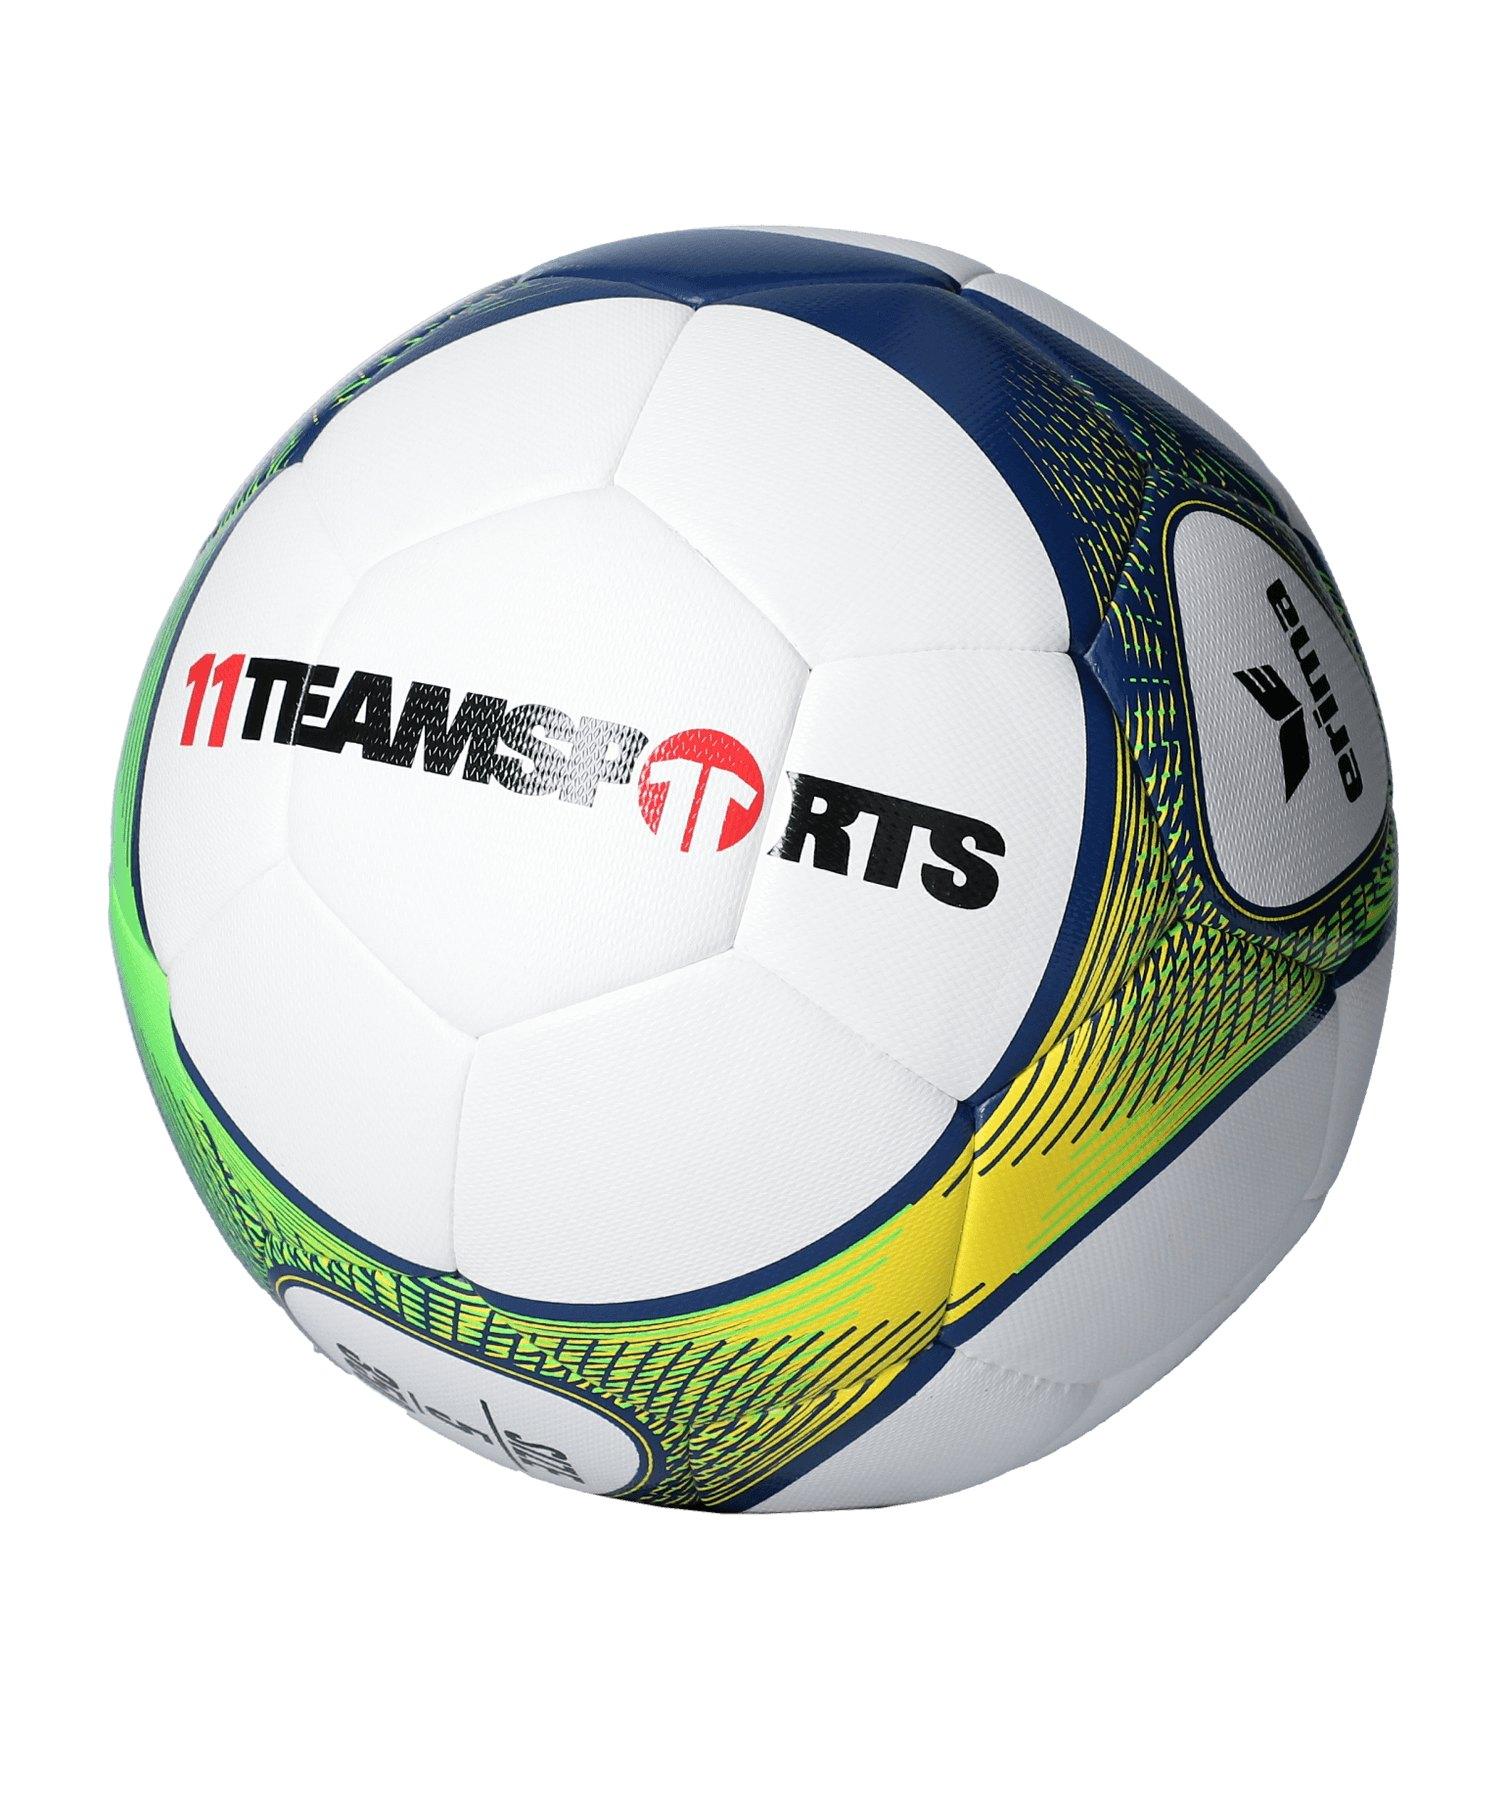 Erima Hybrid Lite 350 Trainingsball Grün Gelb - gruen